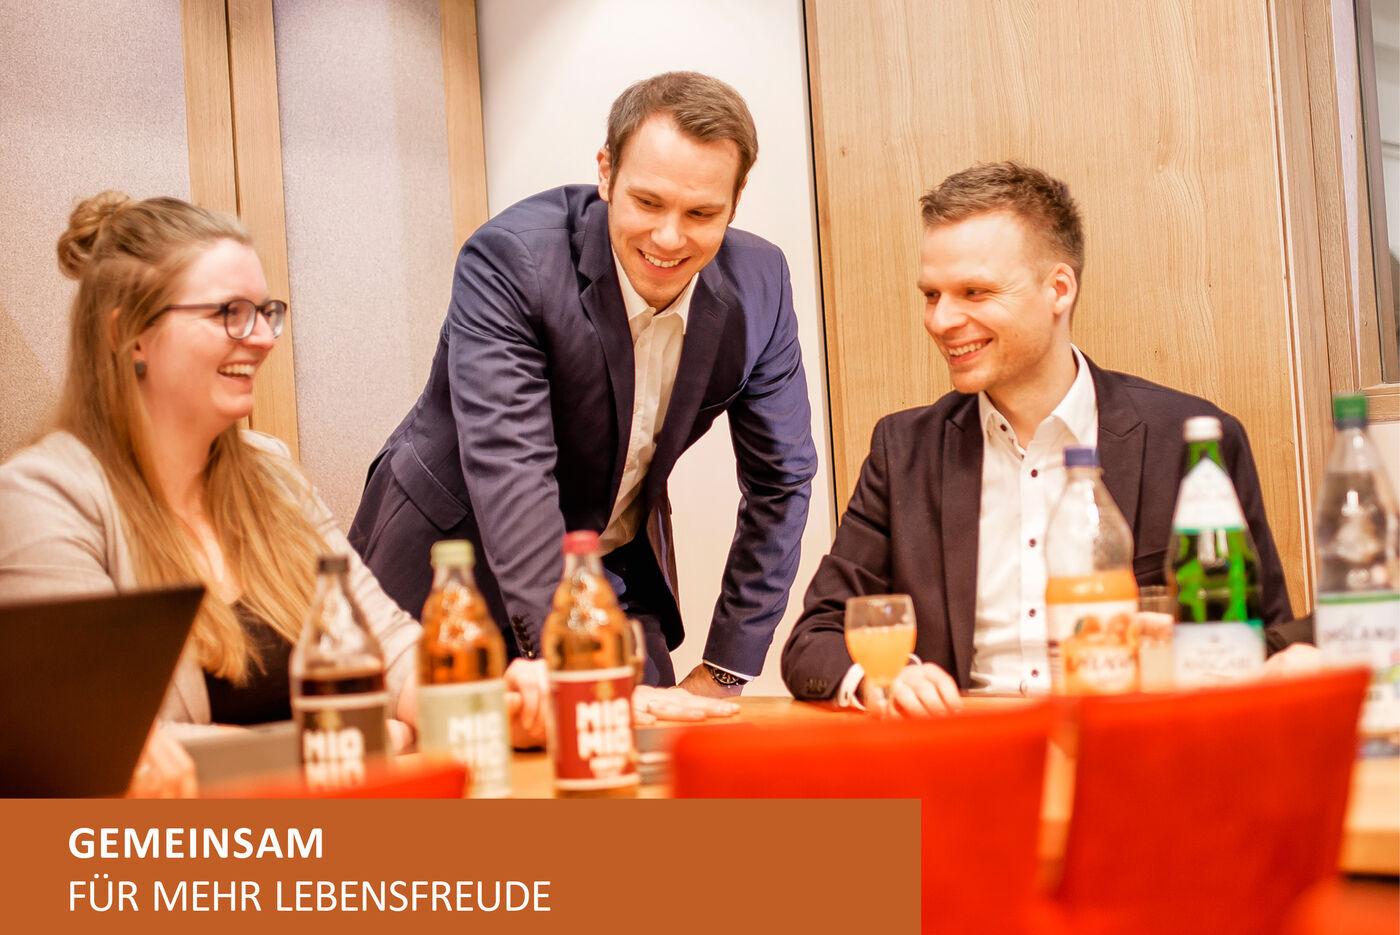 Regionaler Key Account Manager Marke LEH (w/m/d) - Job Haselünne, Homeoffice - Karriere bei Berentzen